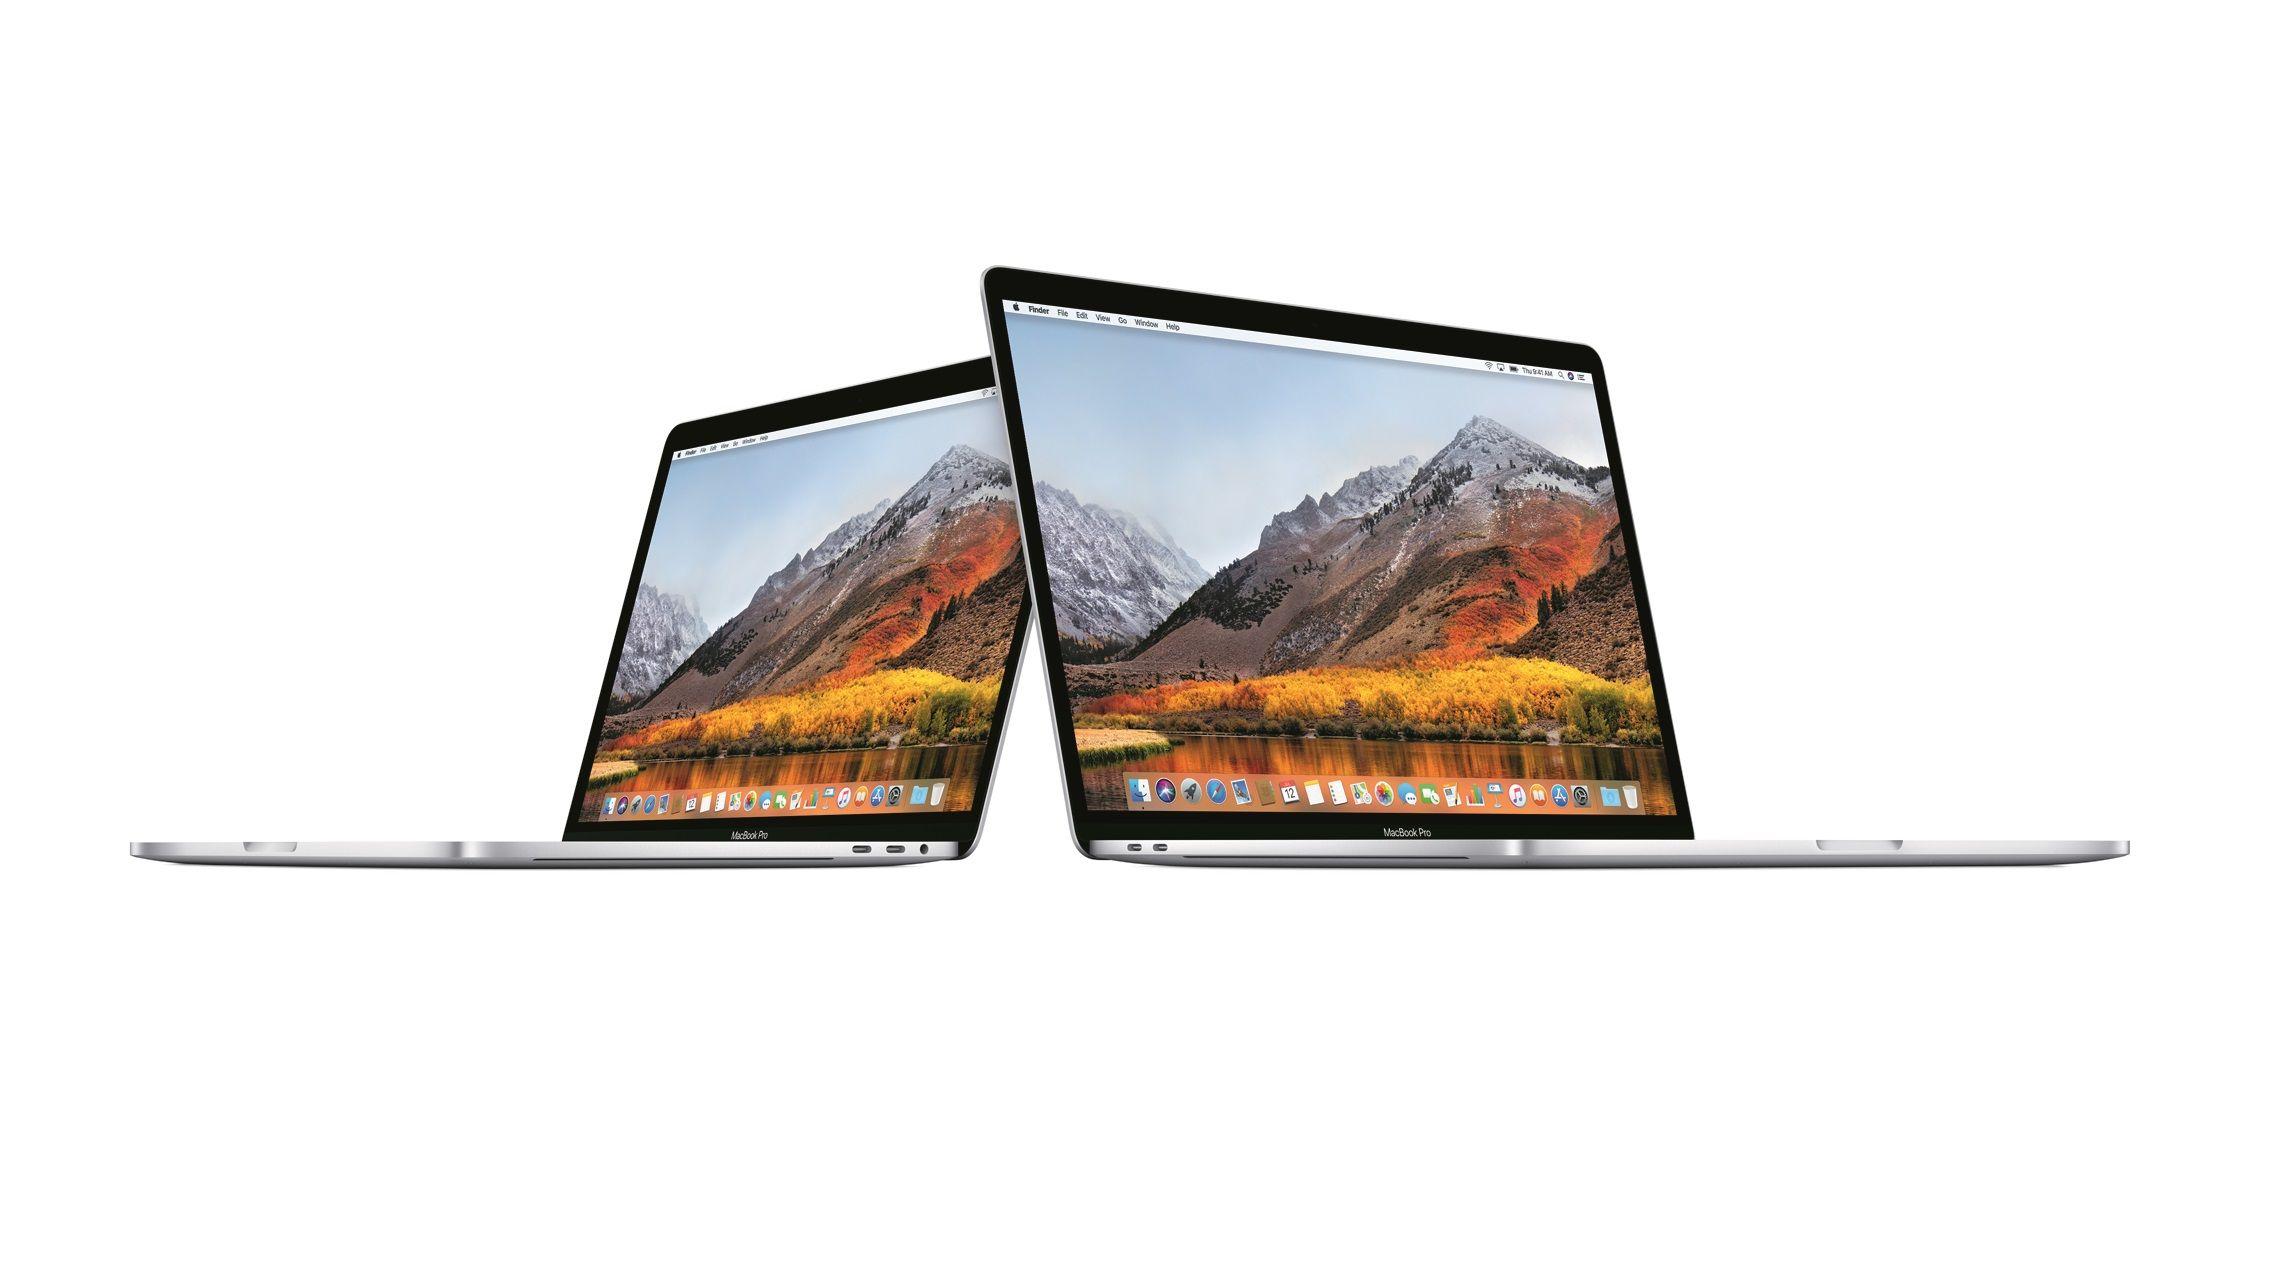 Macbook Pro 2019 Vs Macbook Pro 2018 Is It Worth An Upgrade Newest Macbook Pro Macbook Pro Keyboard New Macbook